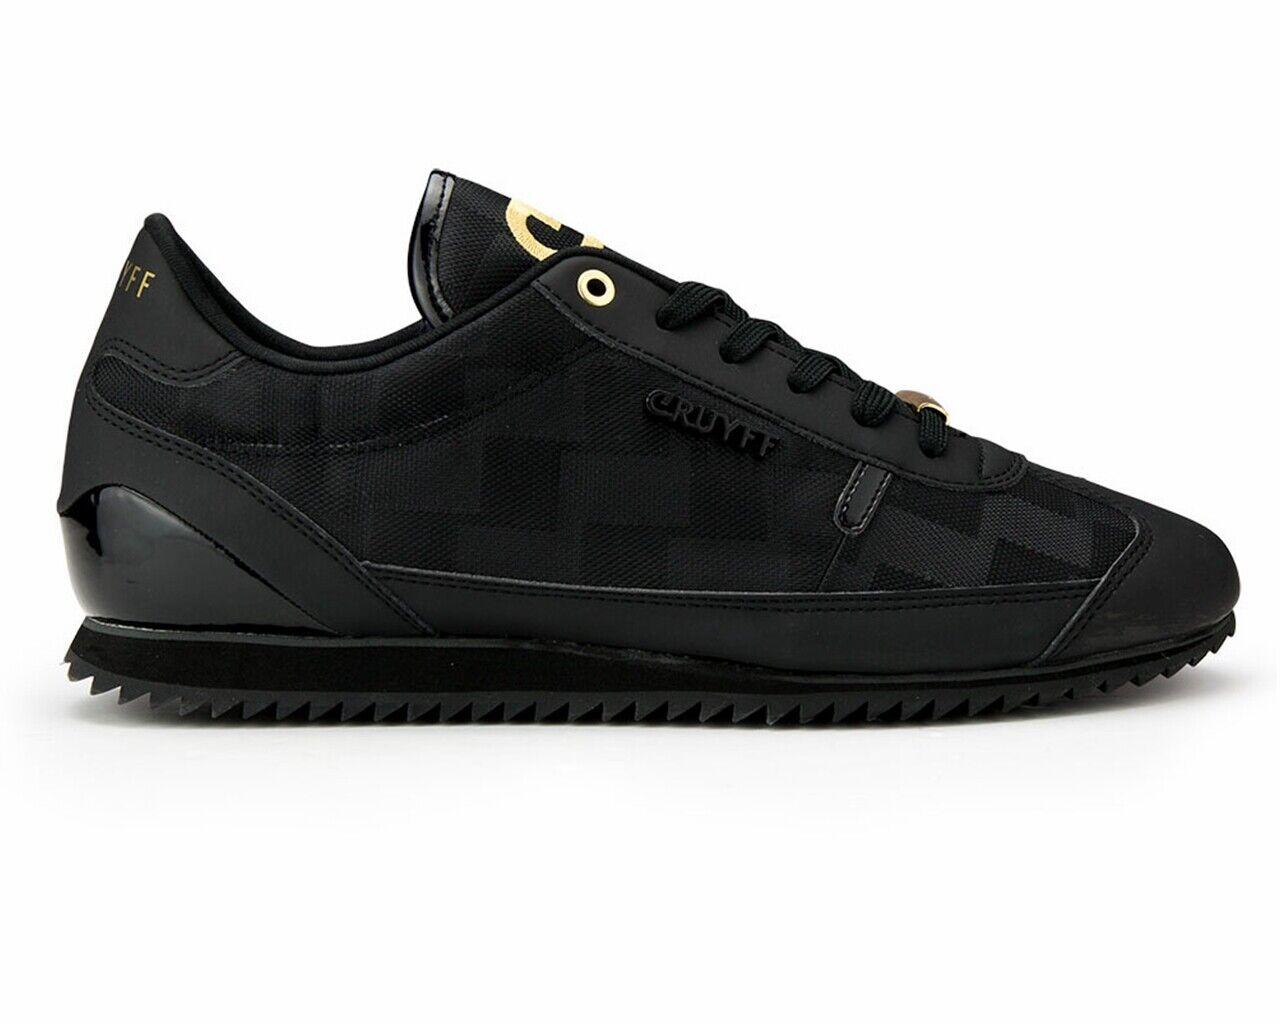 Cruyff montanya CC7680191490 Lacci scarpe da ginnastica Uomo Uomo Uomo Nero Scarpe Da Ginnastica   Ottima selezione    Uomini/Donne Scarpa  d838ba